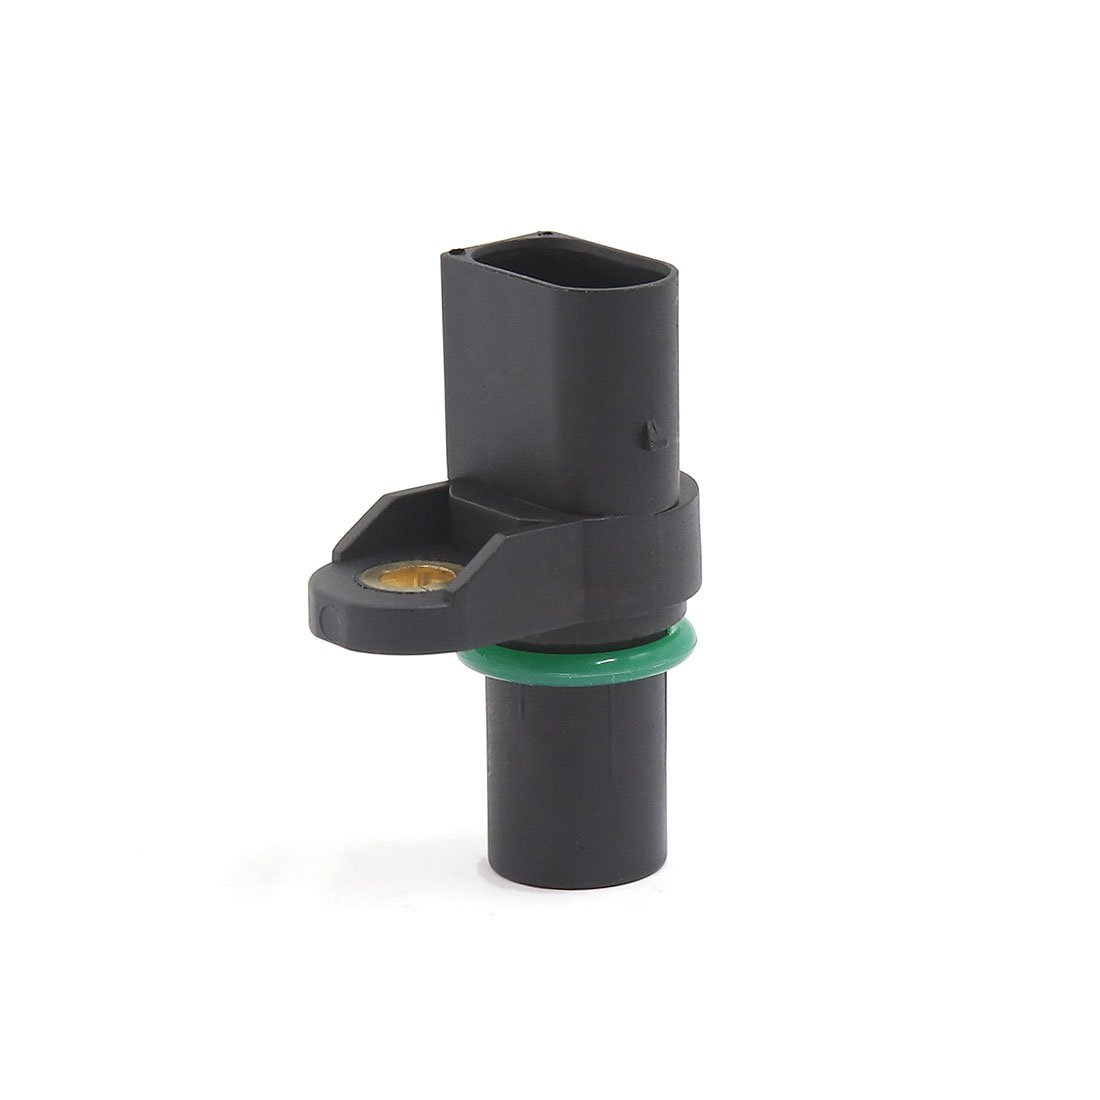 uxcell 12 14 7 518 628 Camshaft Position Sensor Replacement for E46 X5 E39 Z4 Z3 X3 E53 E60 E85 SYNCF1001689